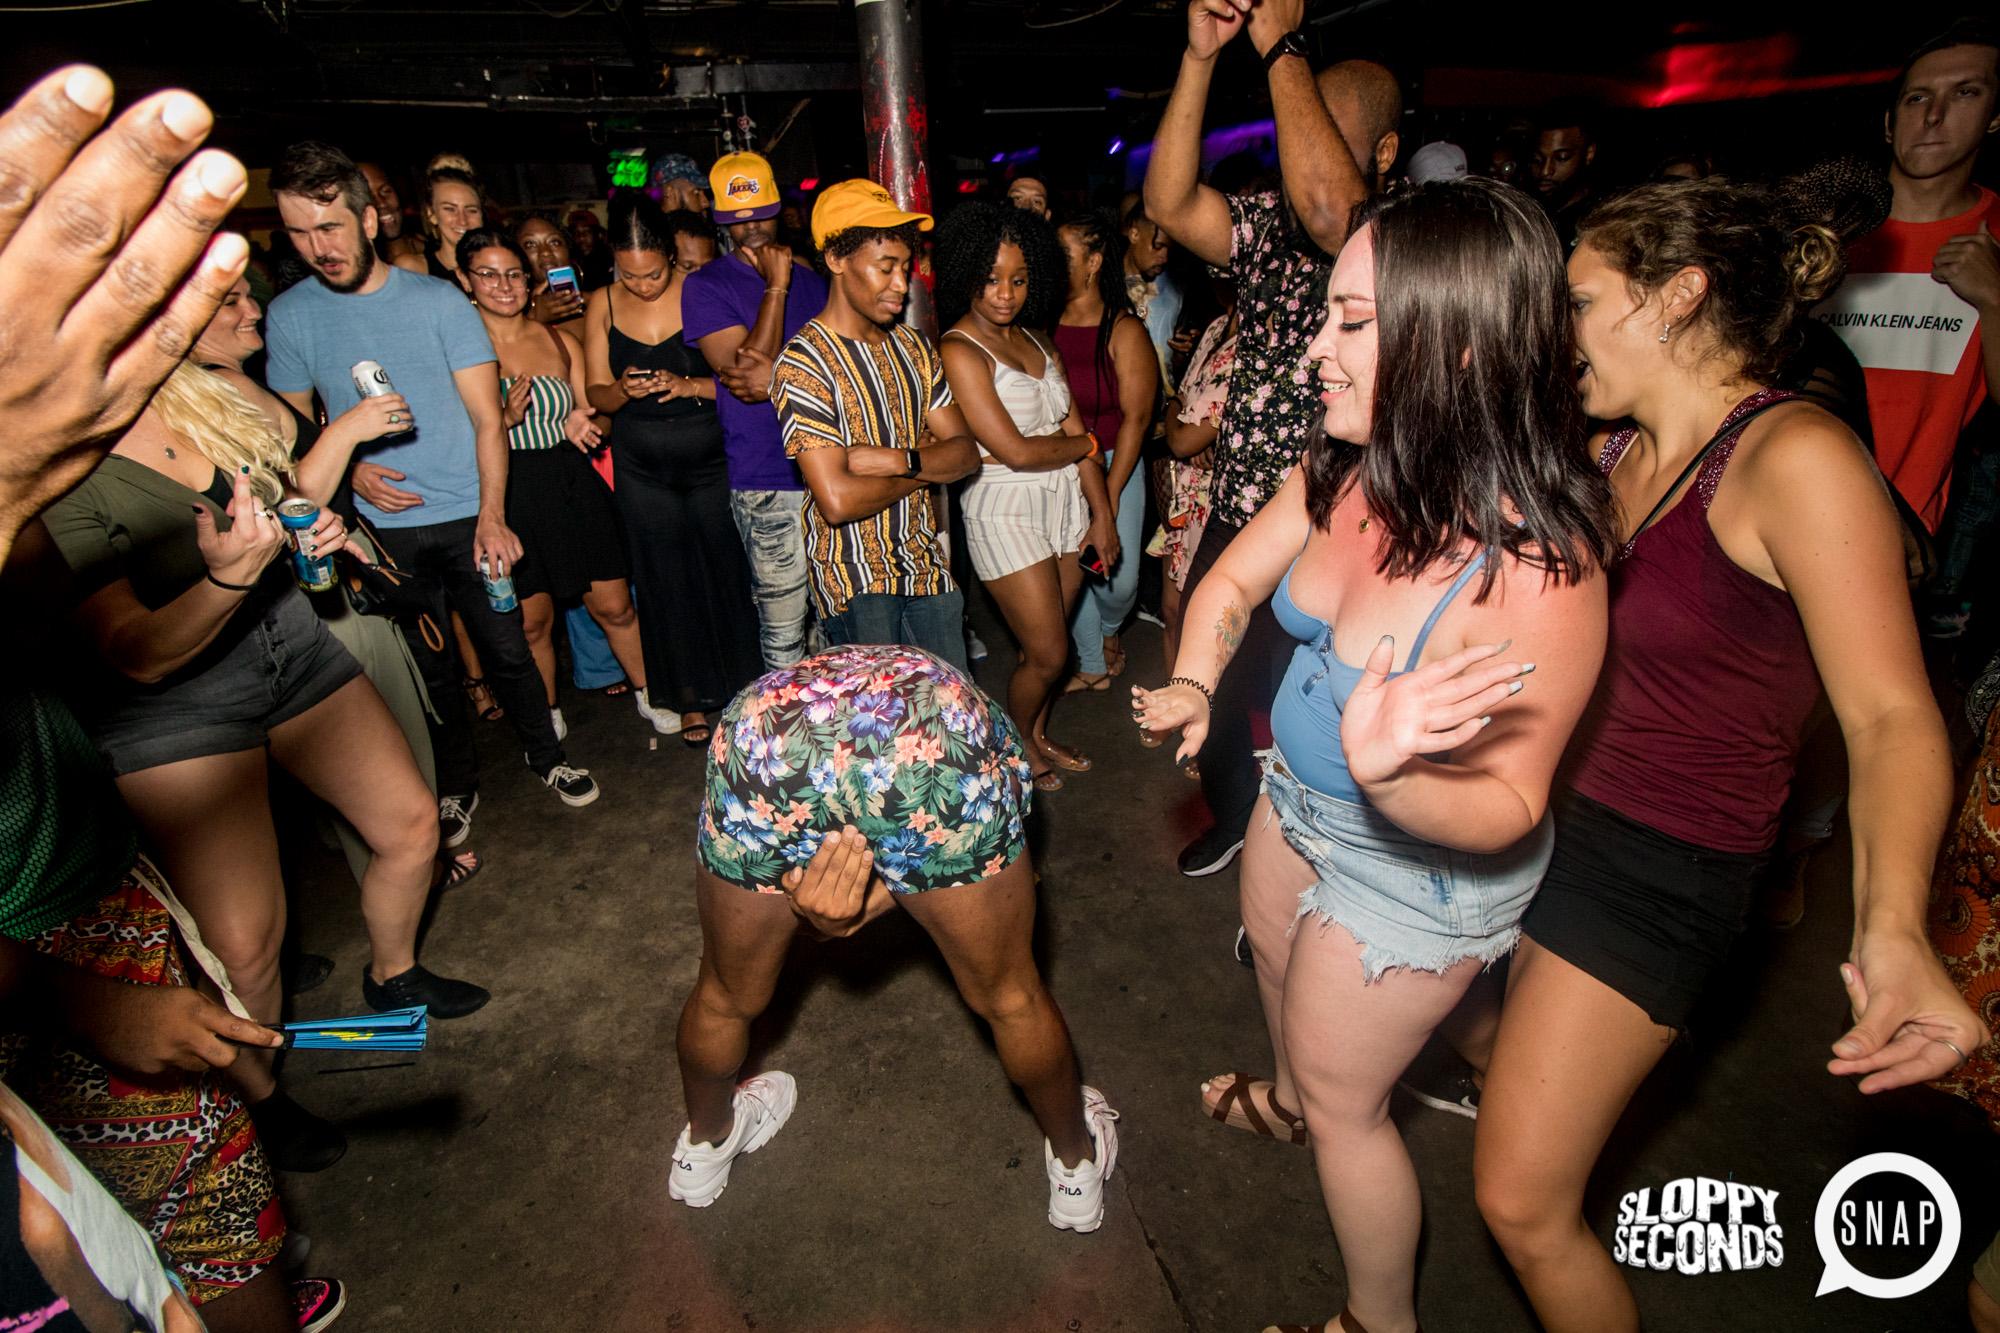 68Sloppy Seconds MJQ Atlanta Grace Kelly Oh Snap Kid.jpg